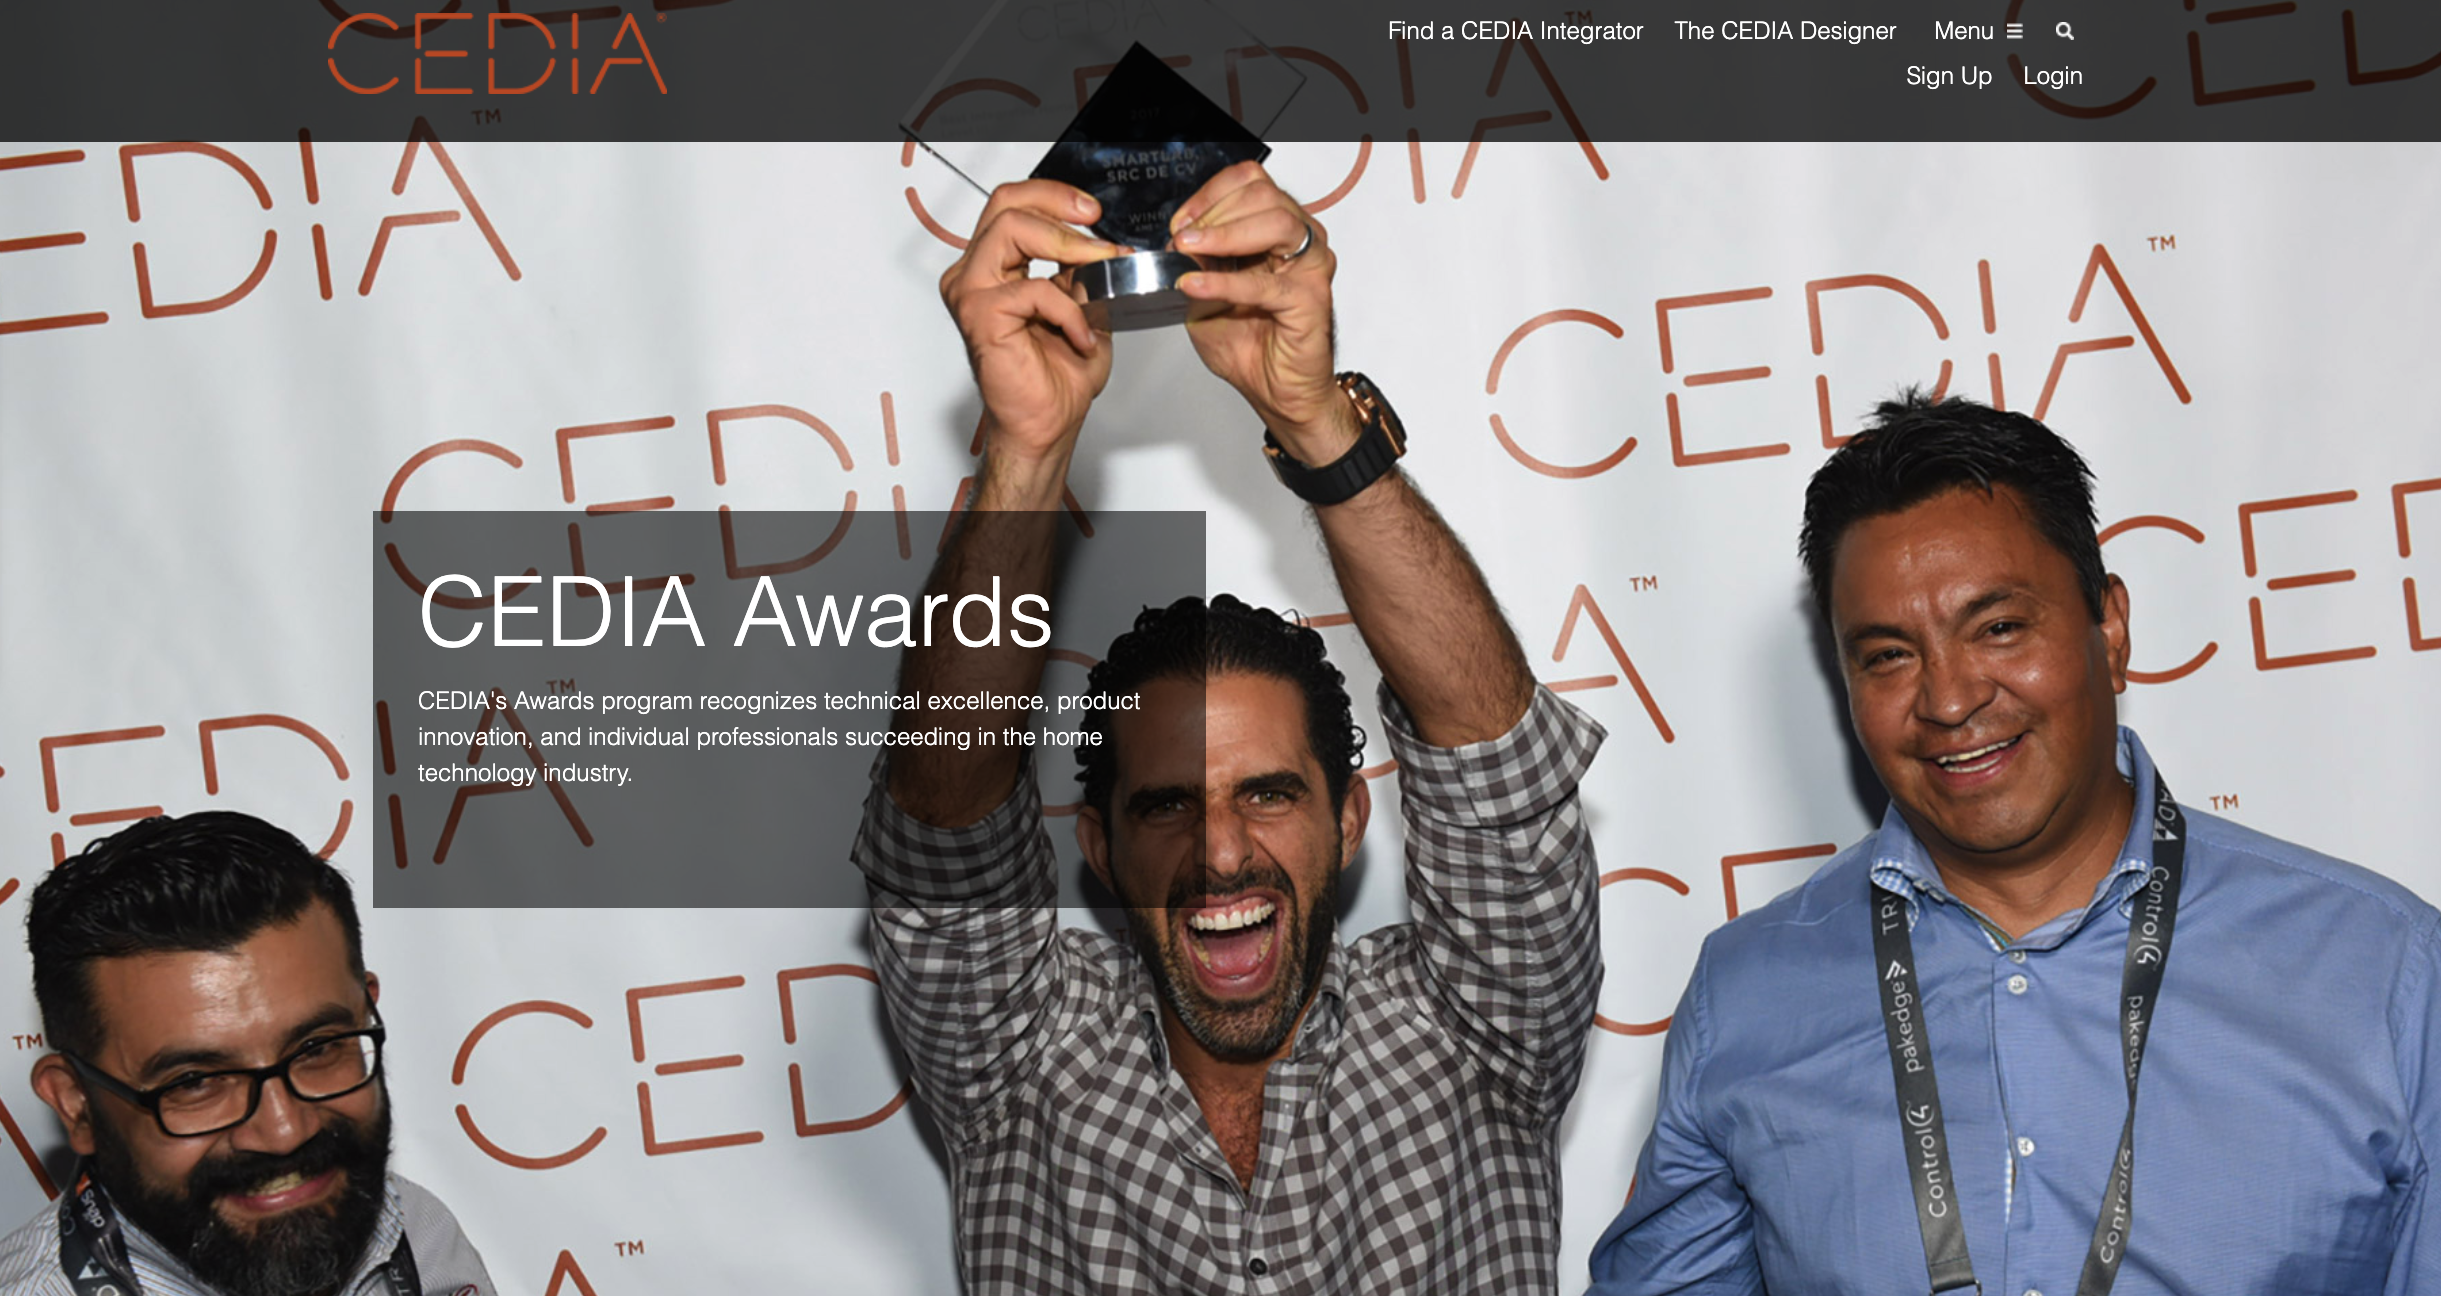 CEDIA Extends Award deadline for 2021